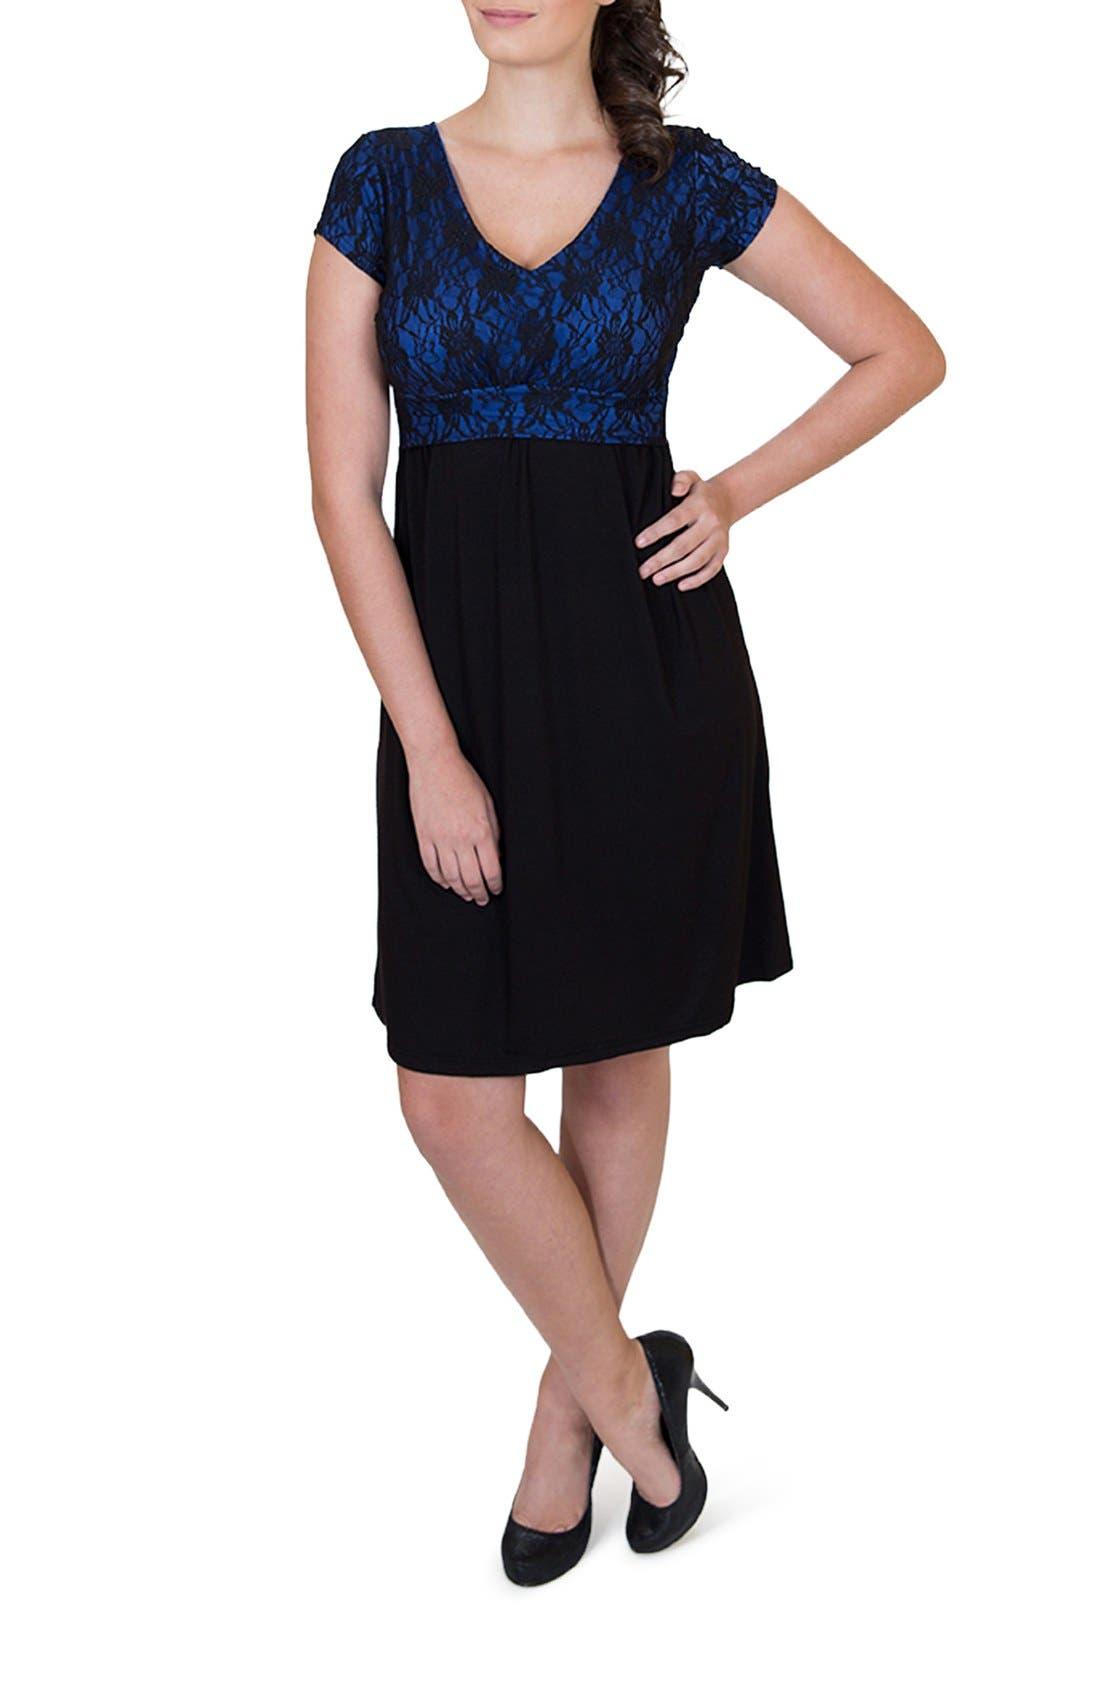 'Camila' Maternity/Nursing Dress,                         Main,                         color, ROYAL BLUE/ BLACK